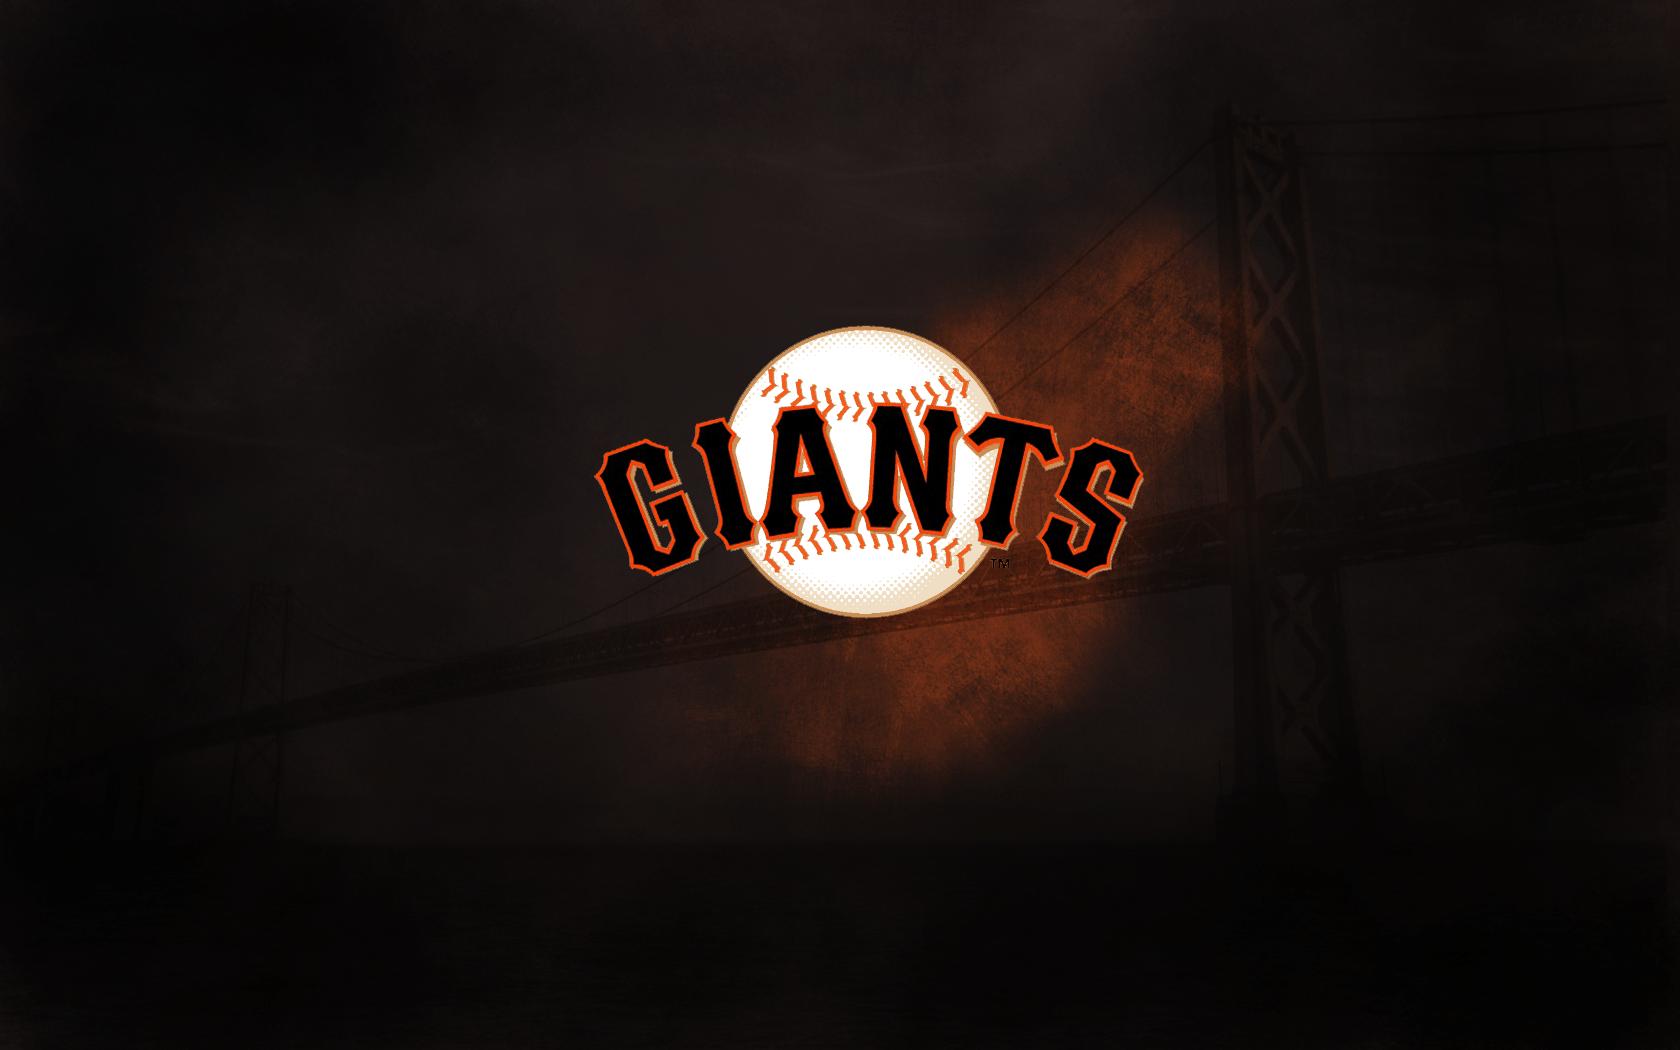 San Francisco Giants Wallpapers Top Free San Francisco Giants